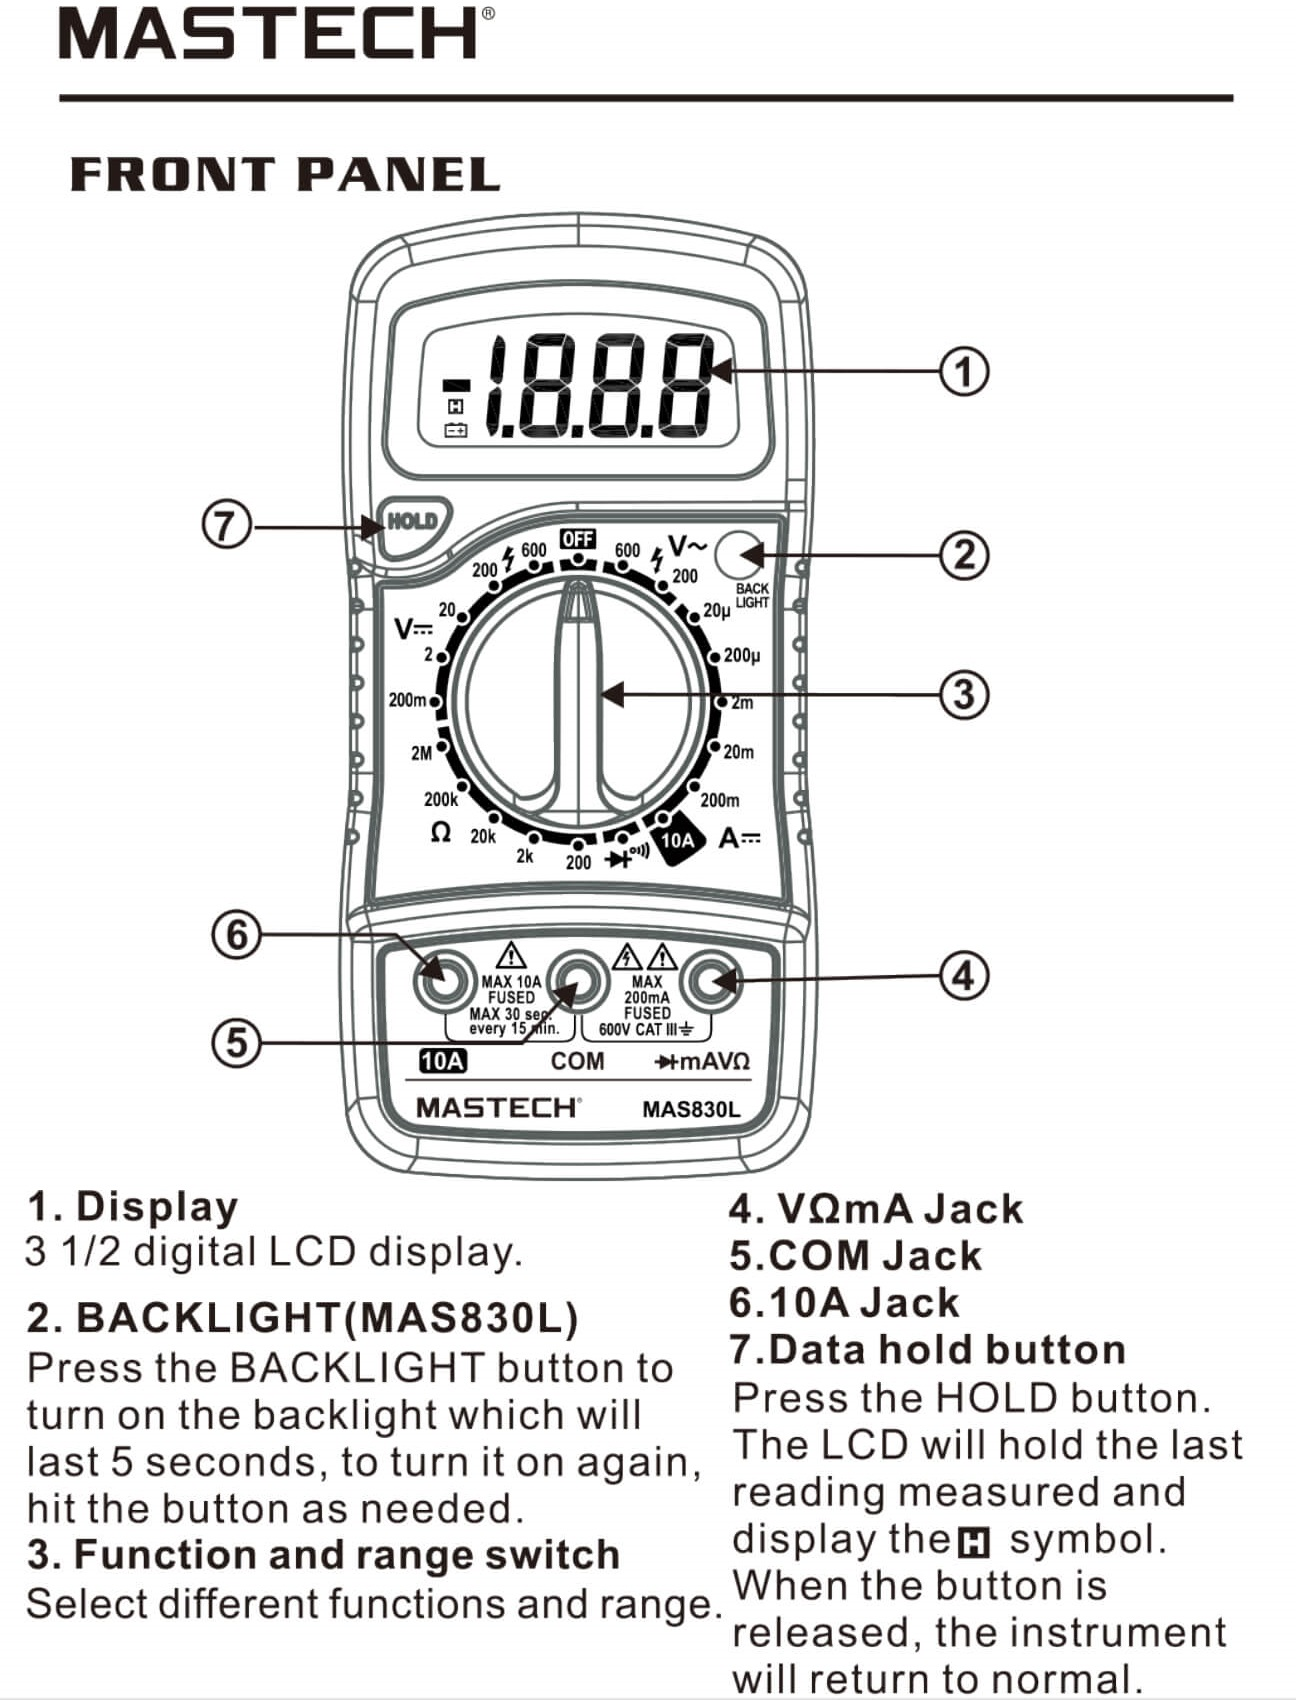 Buy Mastech MAS830L Digital Multimeter at Best Price in India